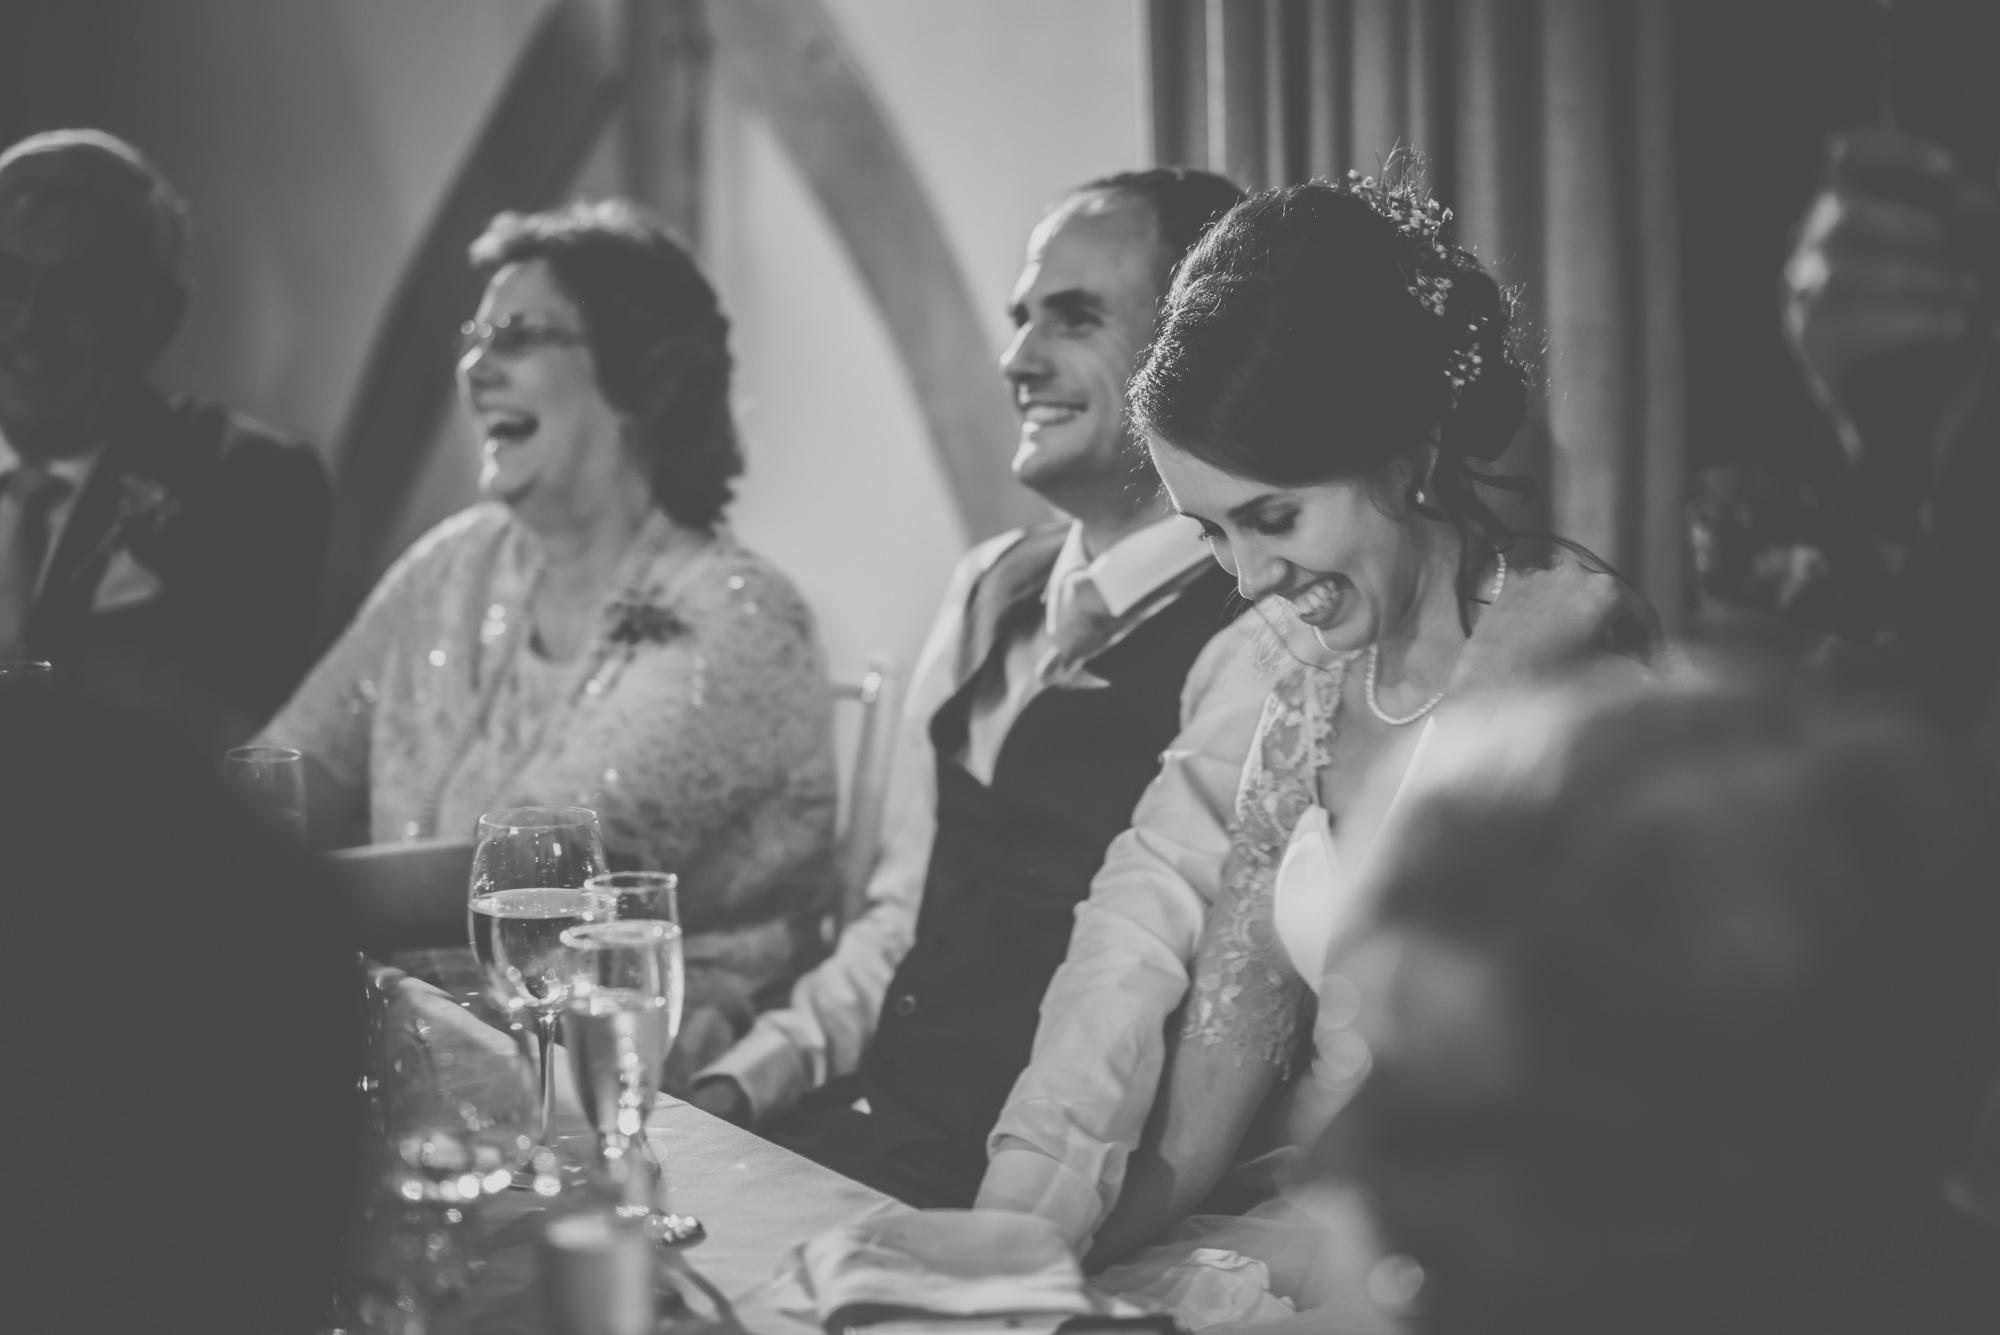 Charisse-and-James-wedding-in-Cain-Manor-Venue-Hampshire-Manu-Mendoza-Wedding-Photography-451.jpg